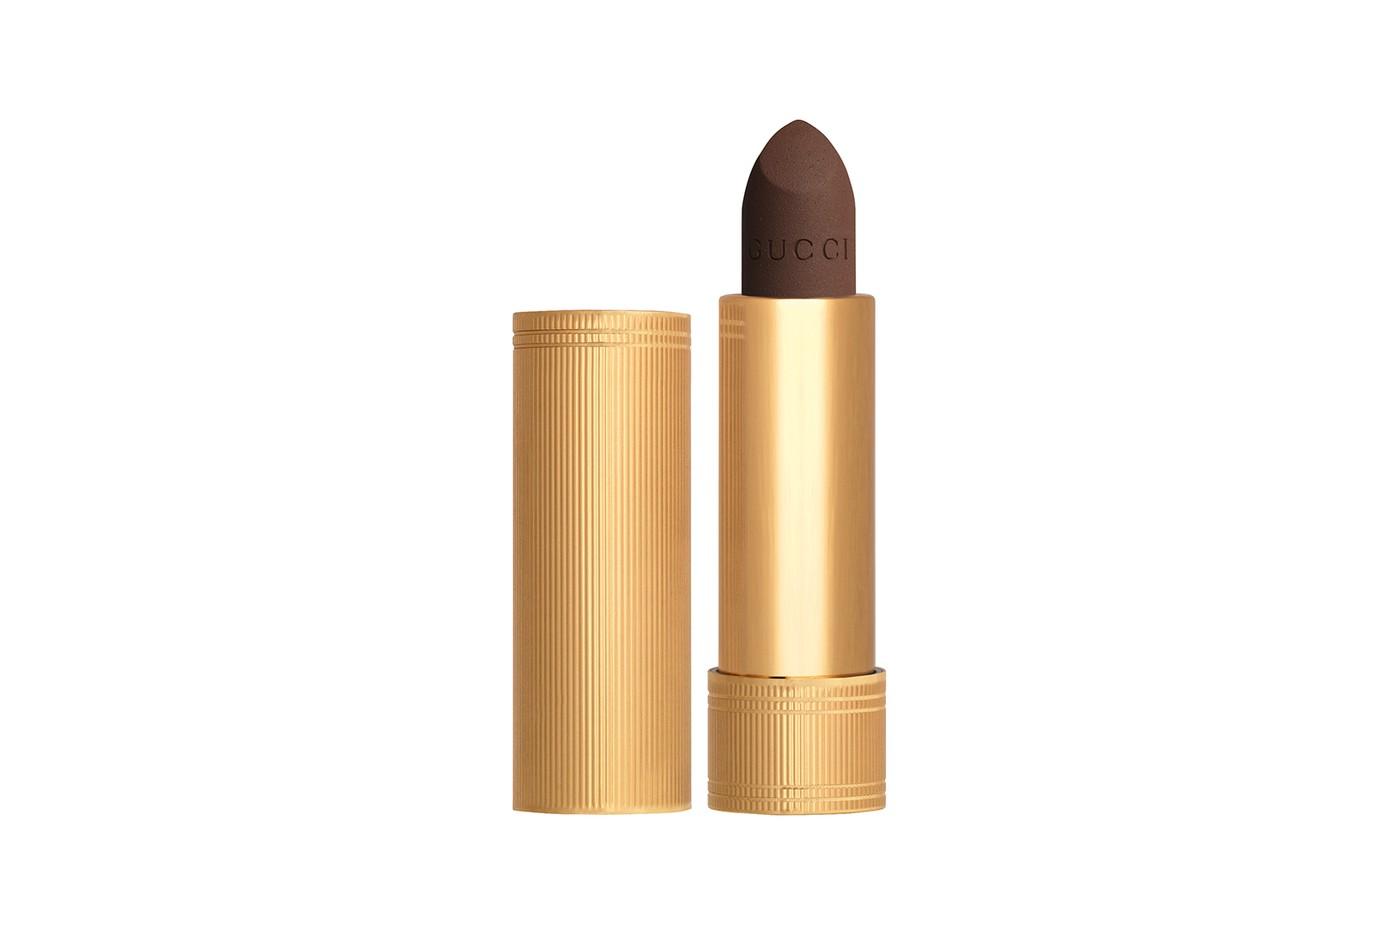 gucci beauty matte lipstick collection rouge a levres mat shades purple orange brown release